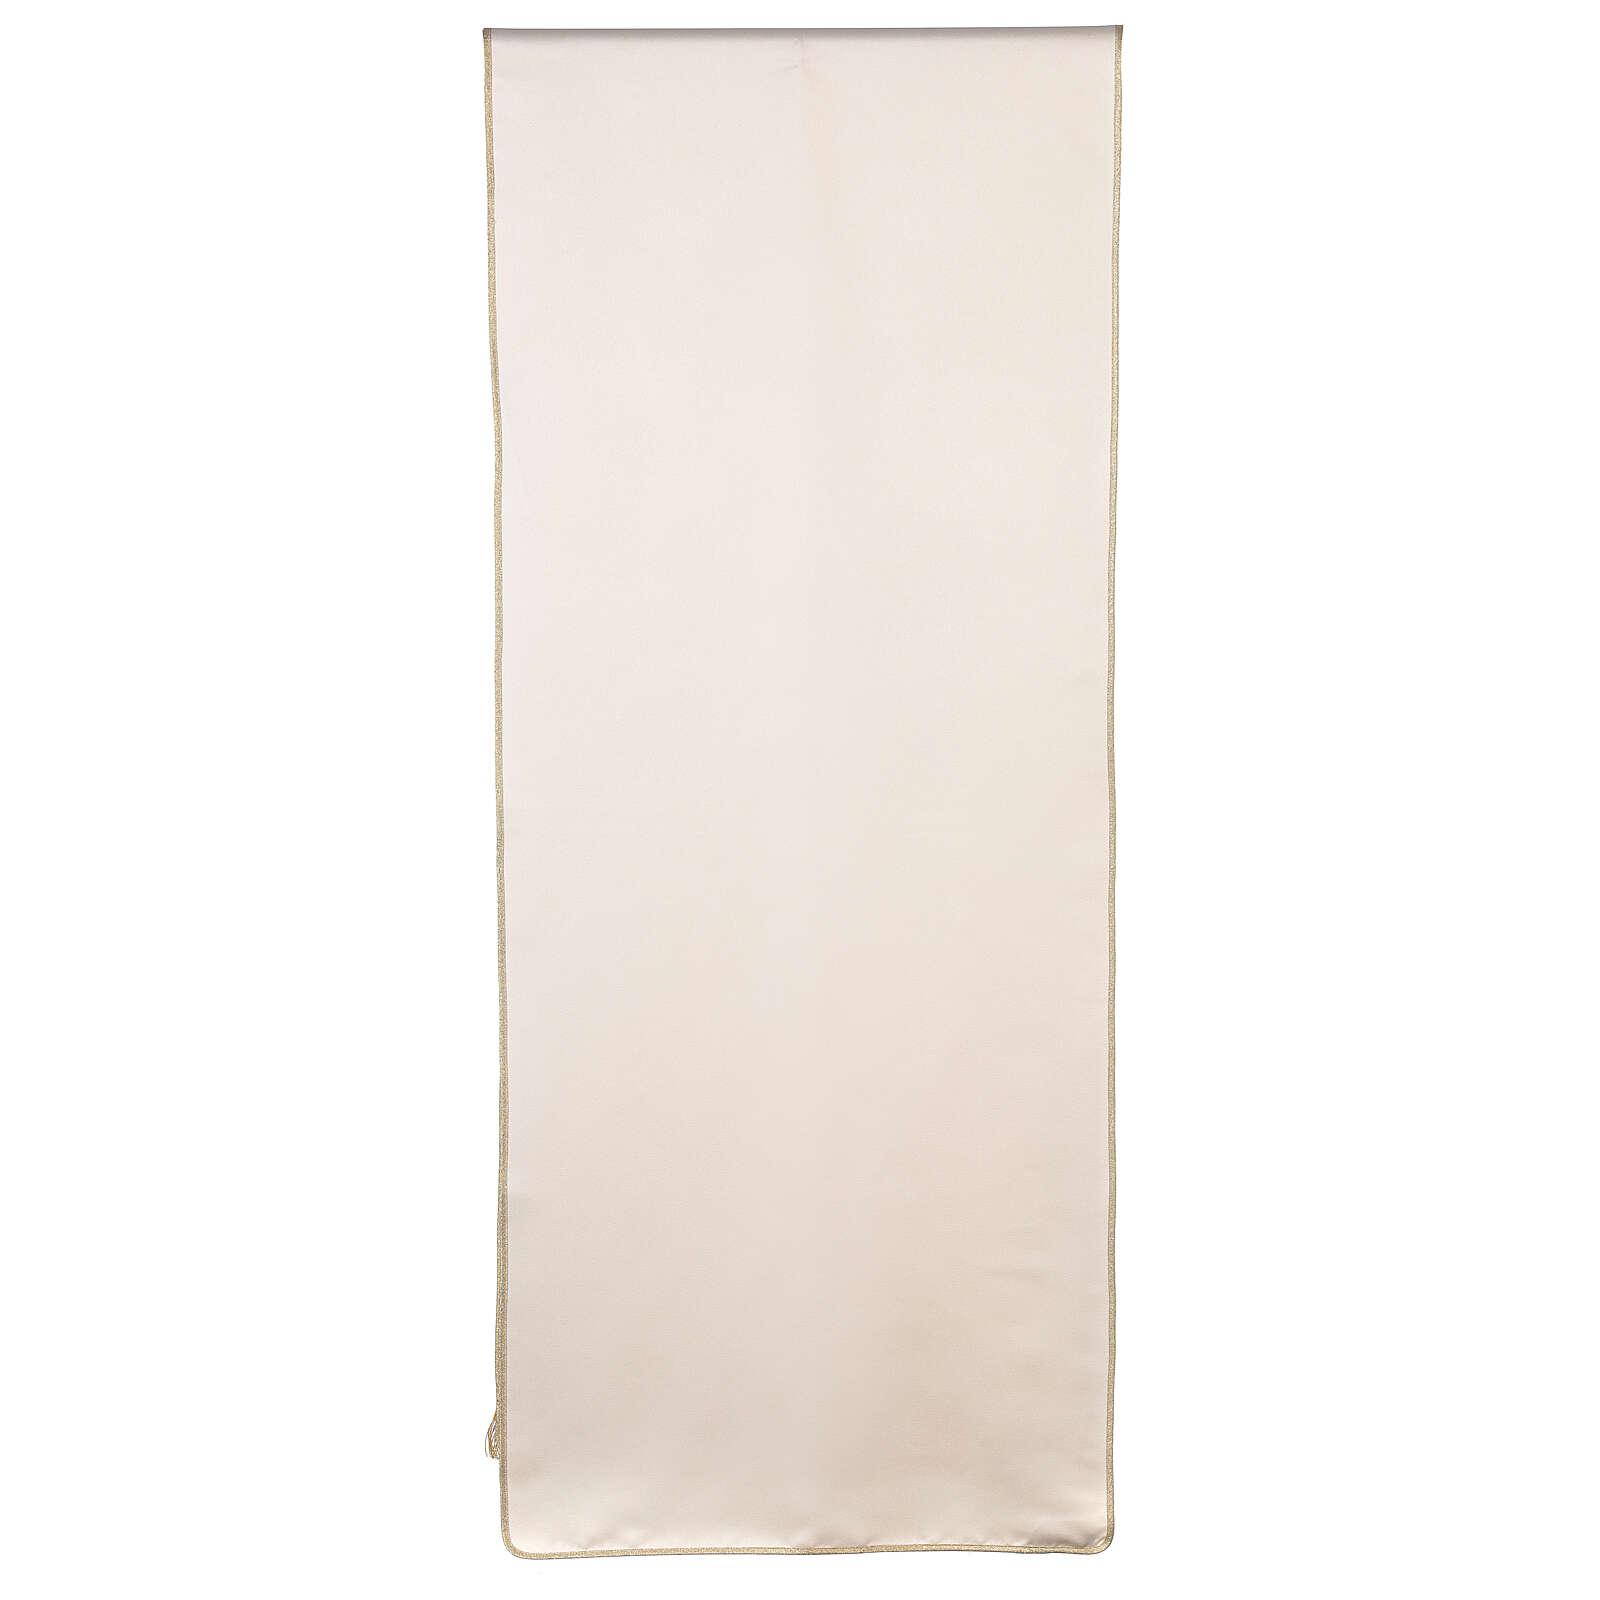 Voile de lutrin marial broderie satin 100% polyester 4